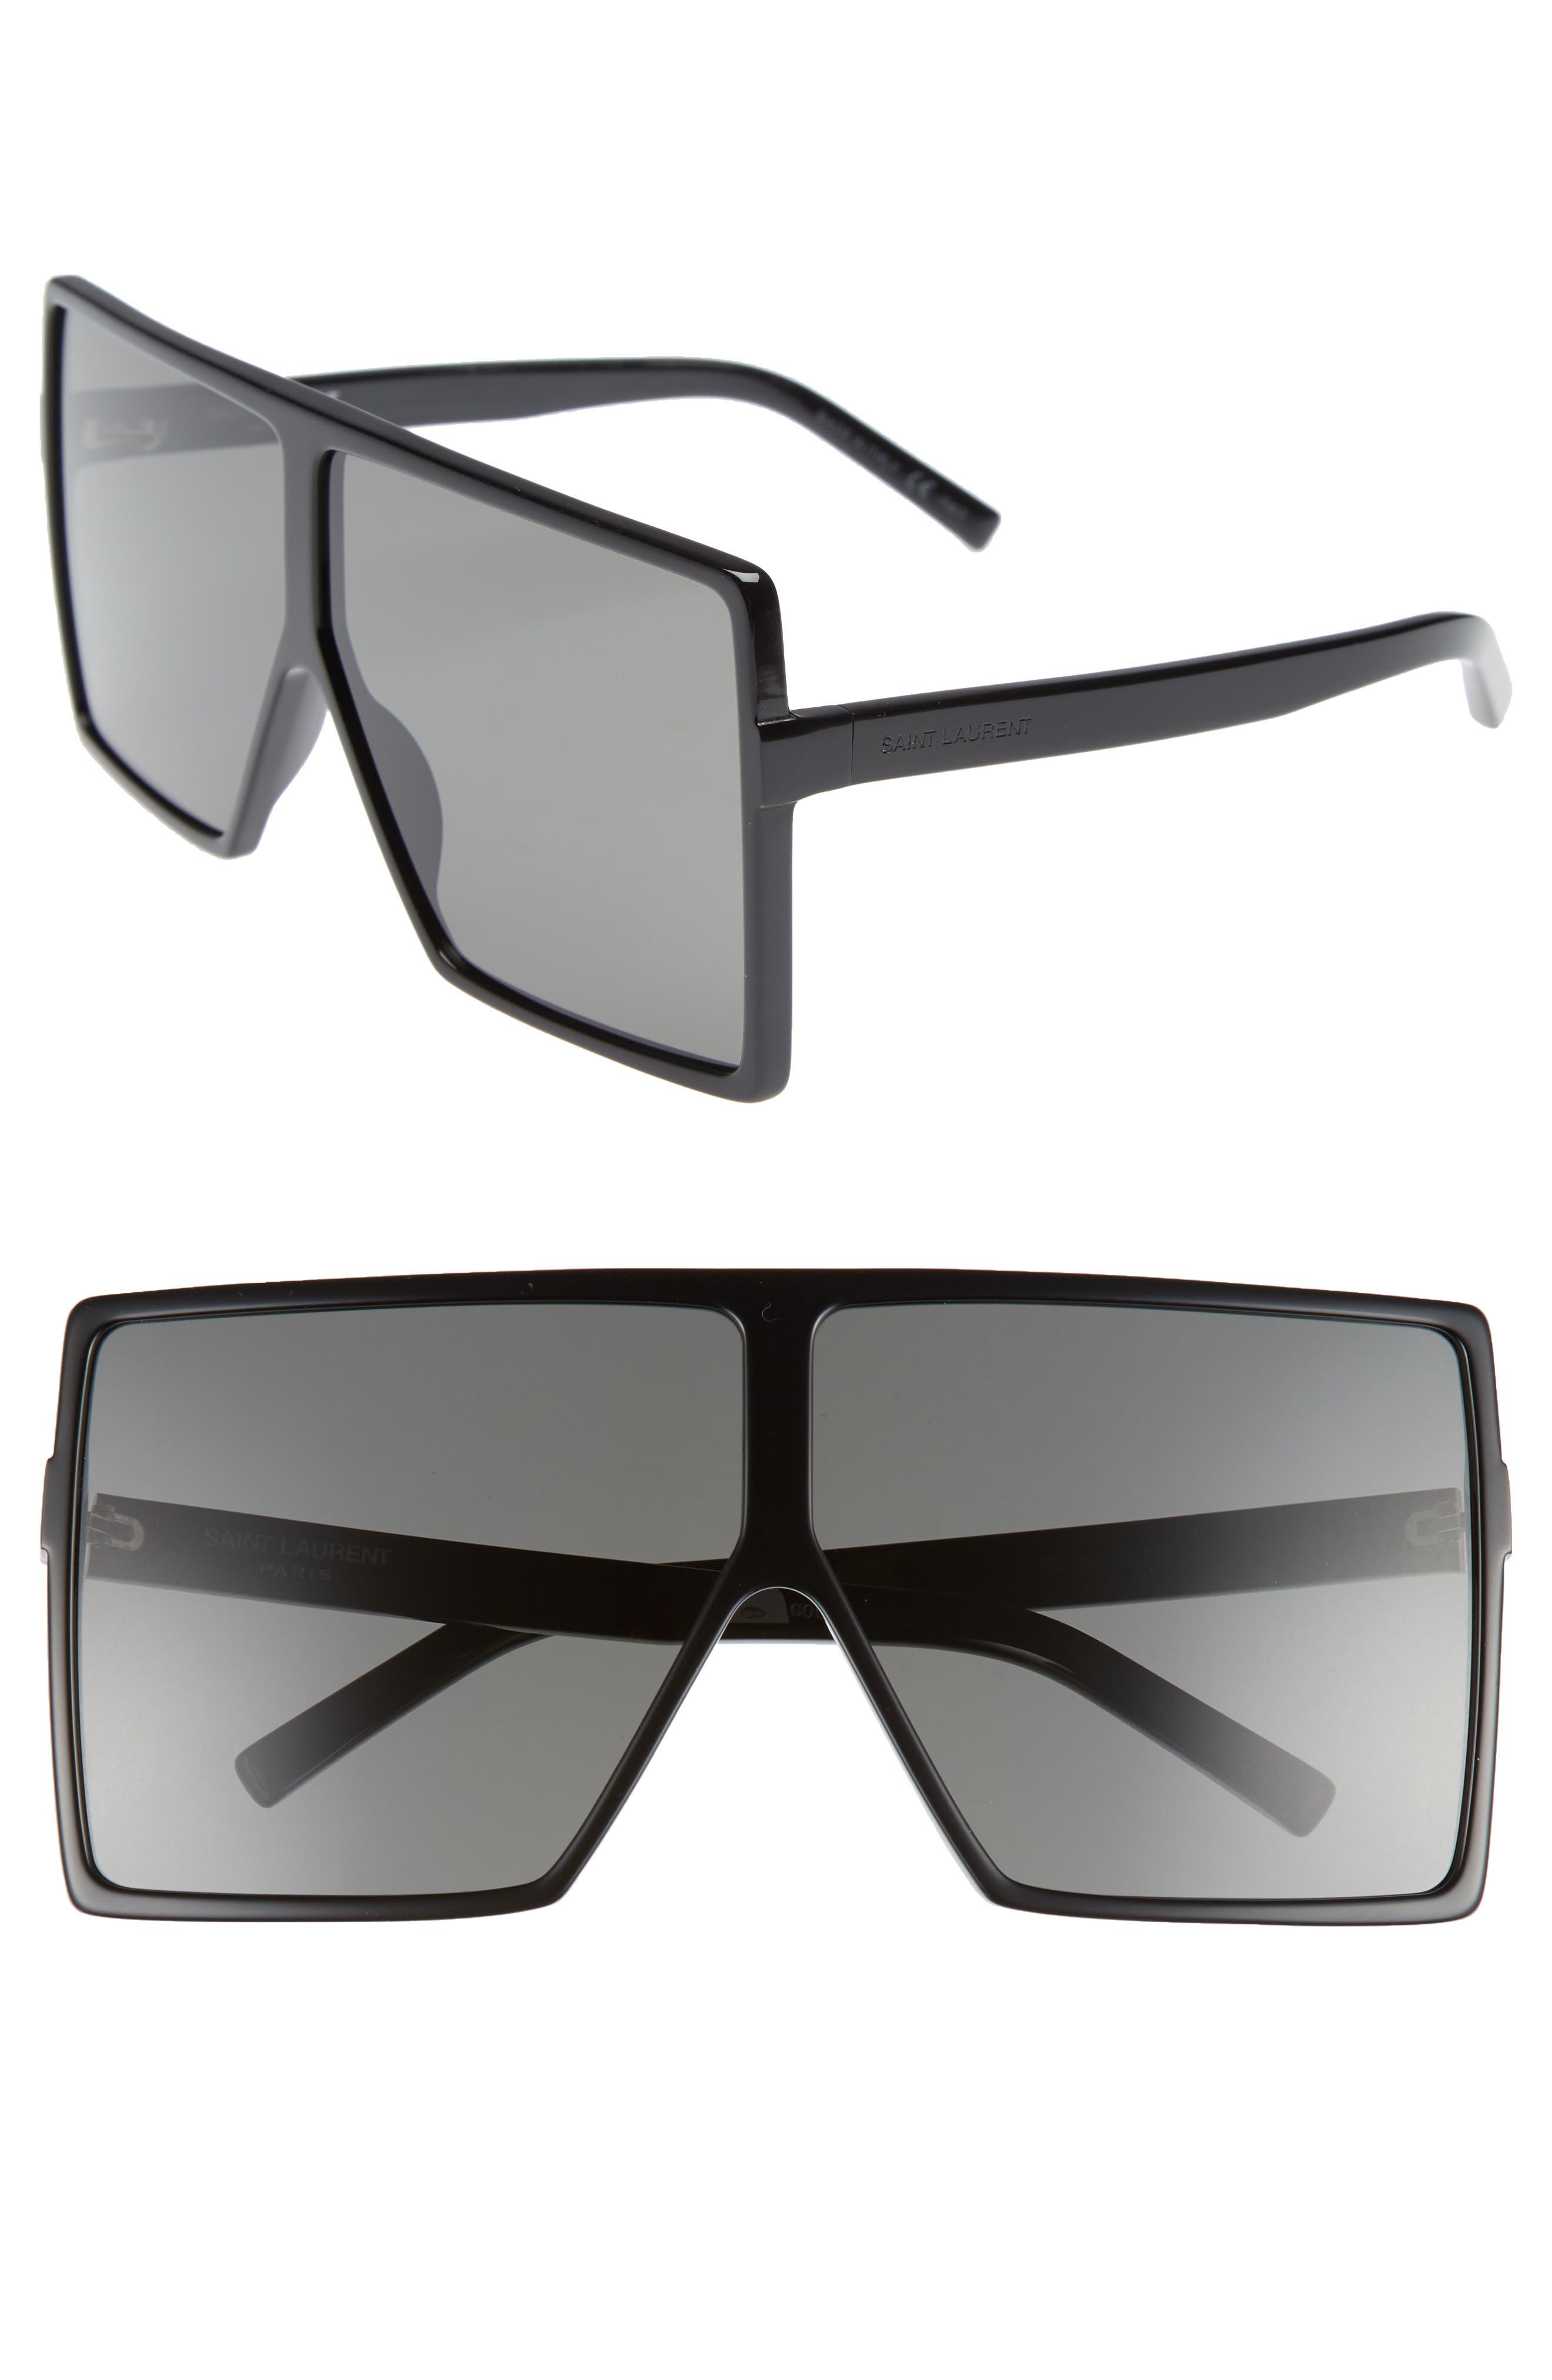 Saint Laurent 68mm Oversize Square Sunglasses